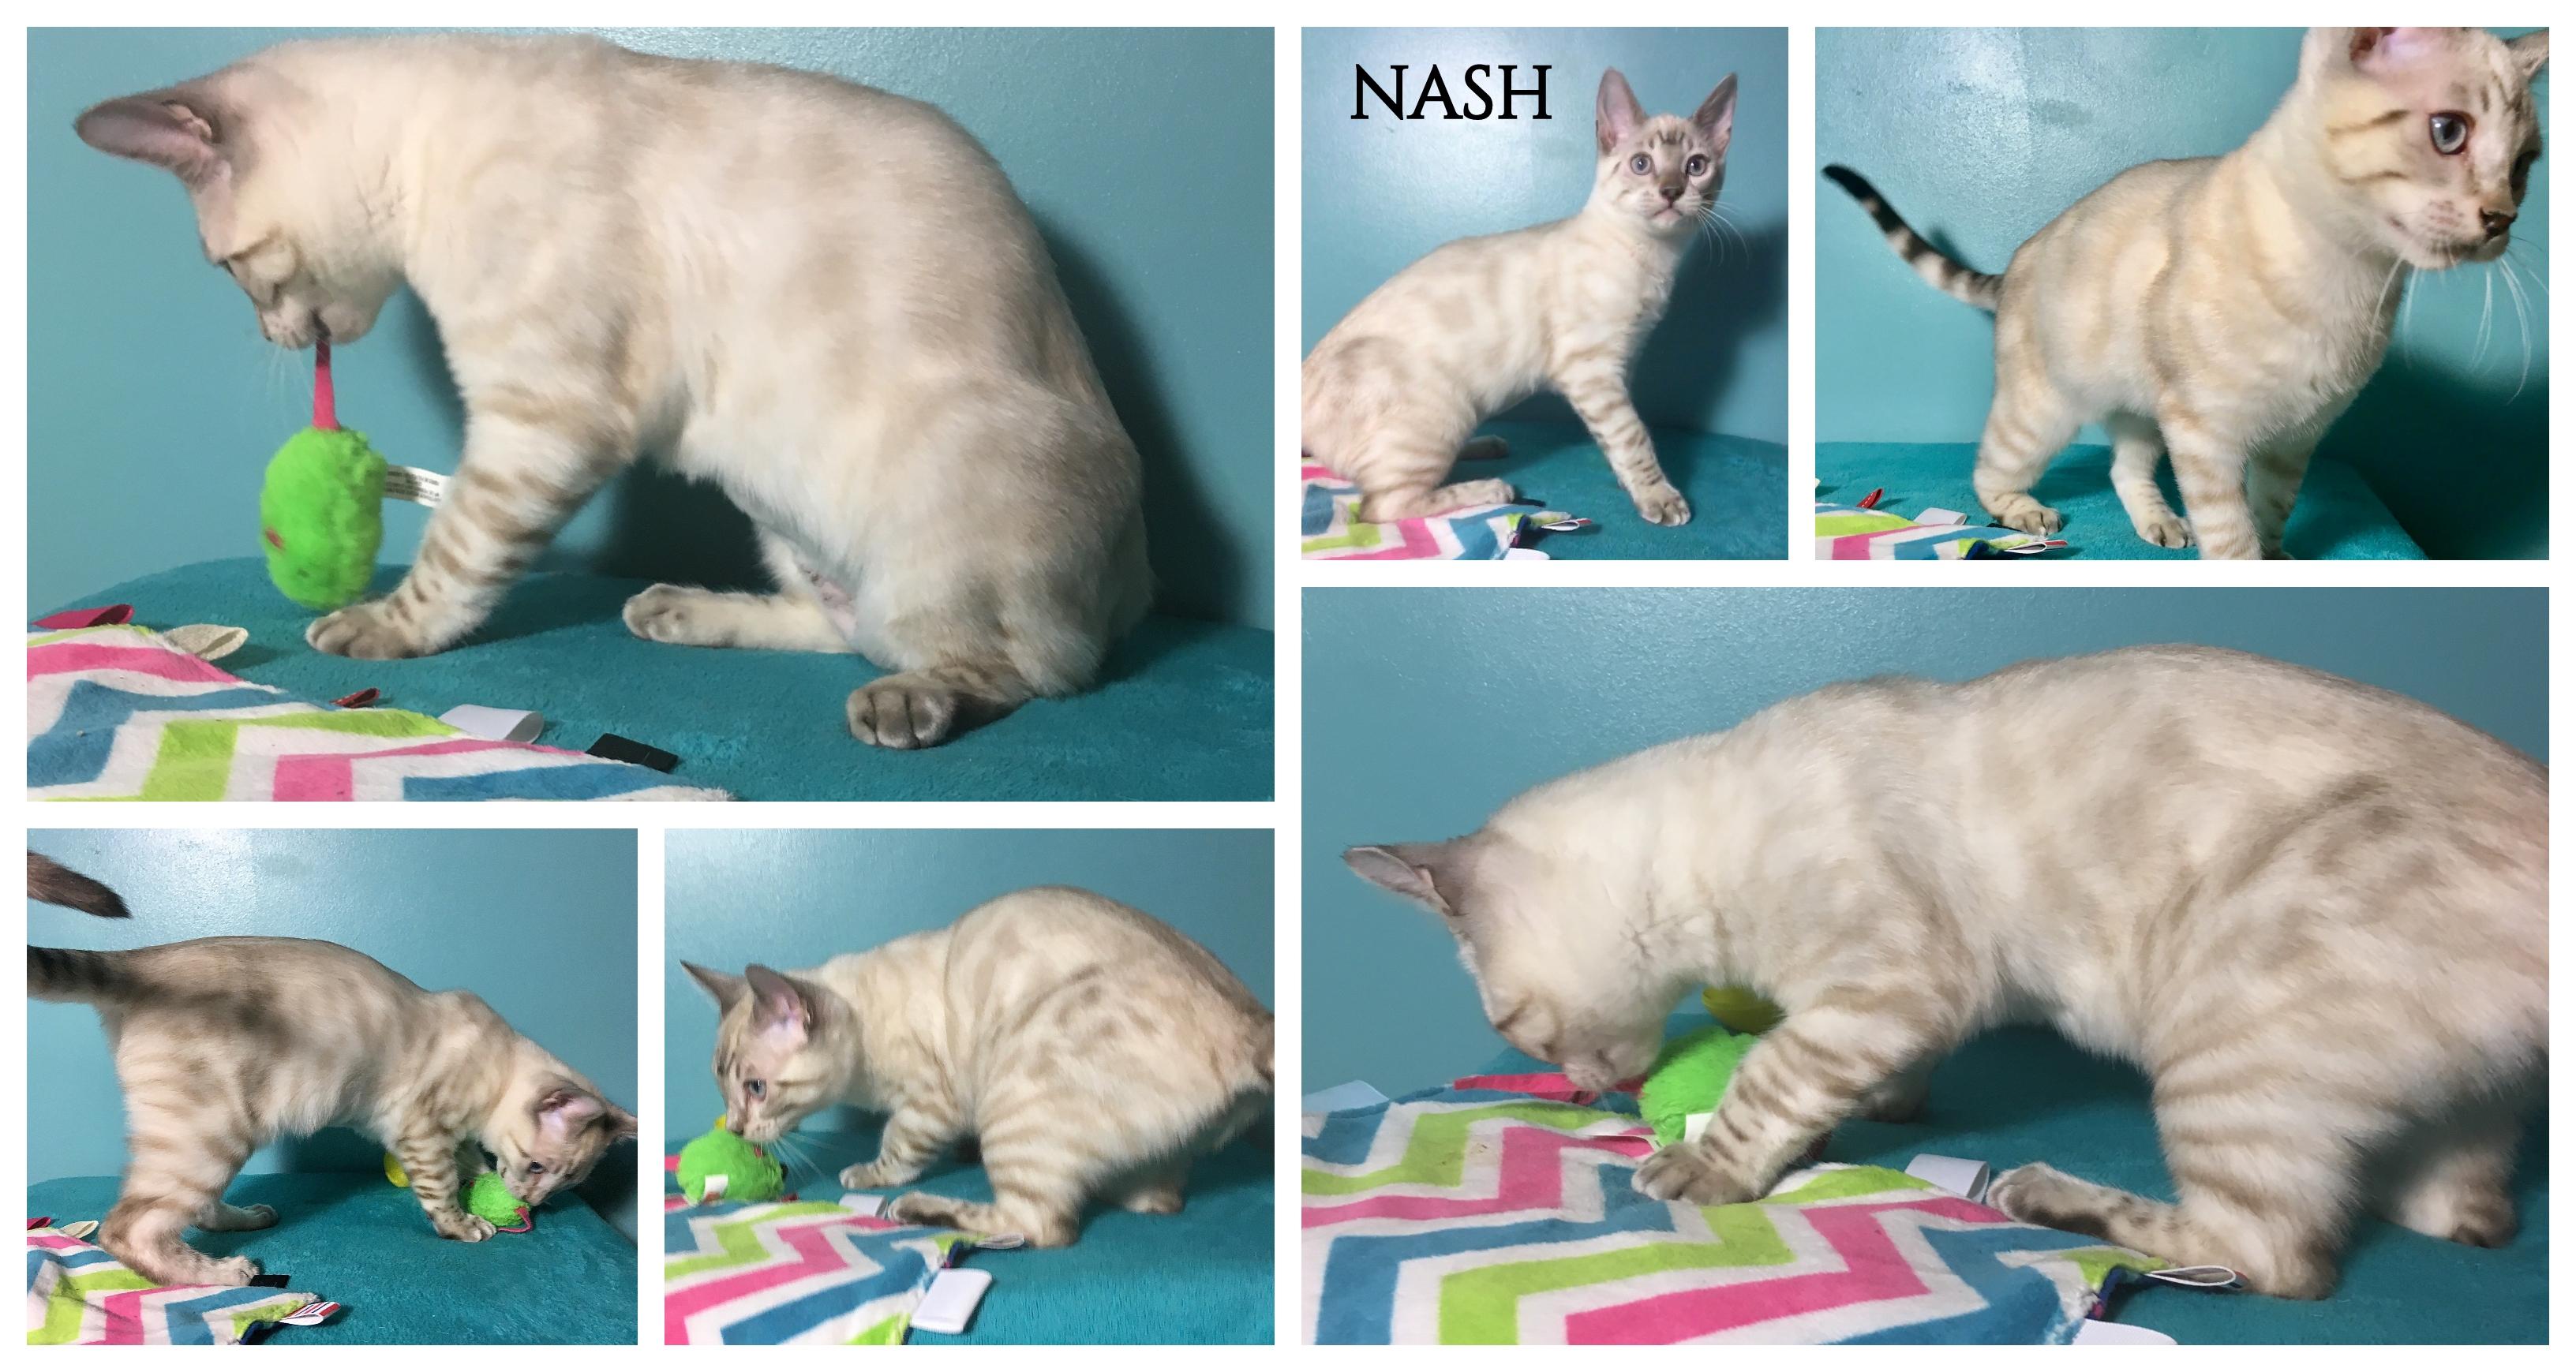 Nash 16 weeks